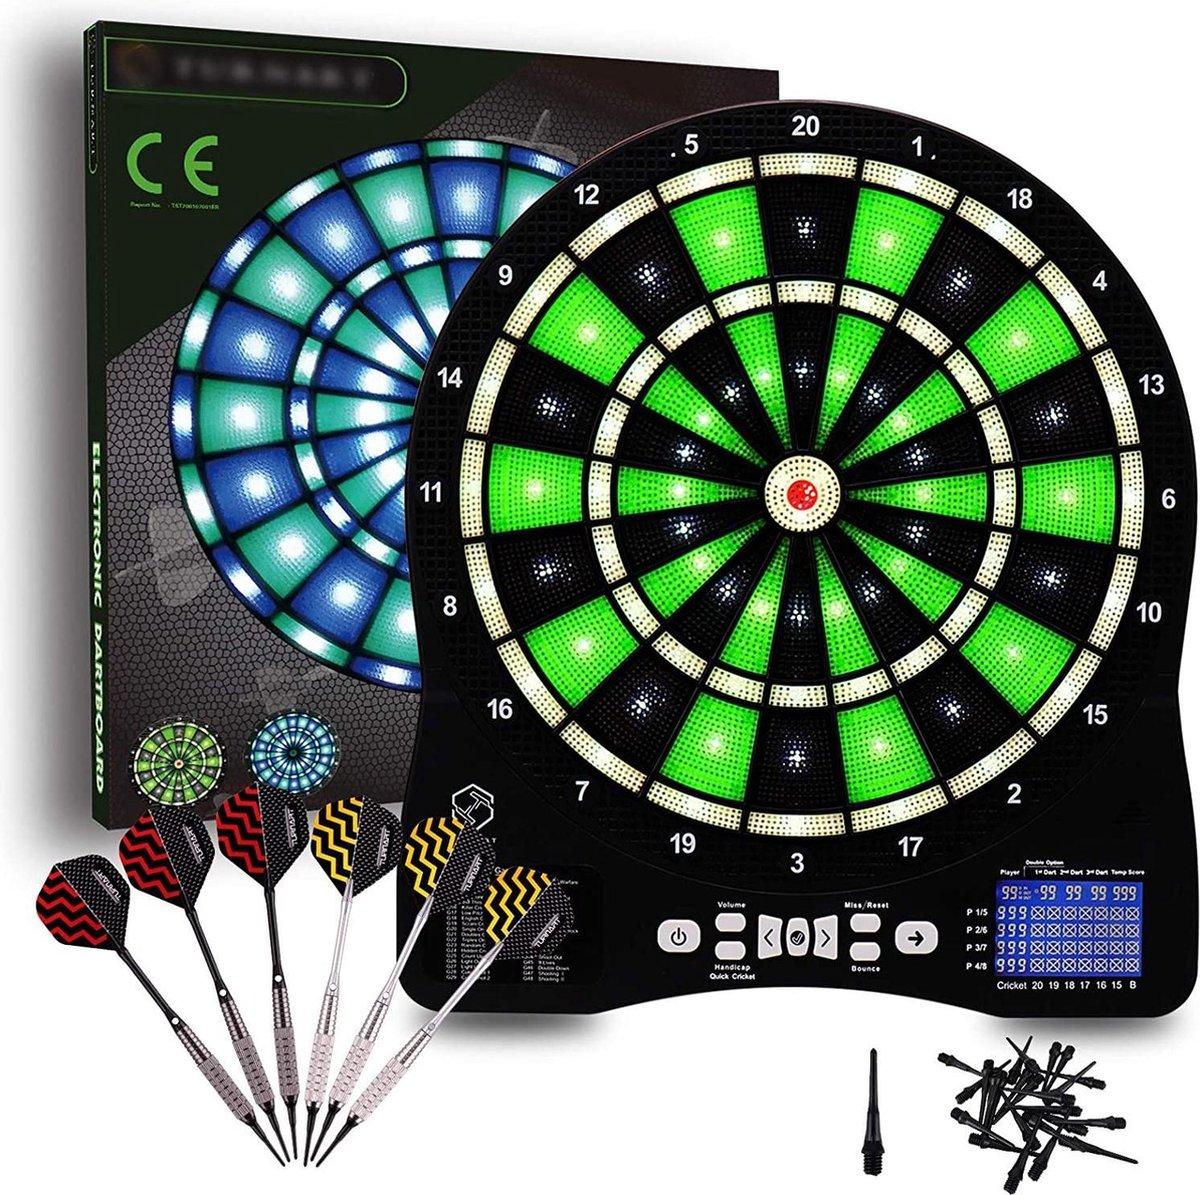 Dart Verlichting - Zinaps Elektronische Dartboard met LED-verlichte nummers Professionele 6 darts Zachte elektronische dartboard- (WK 02127)